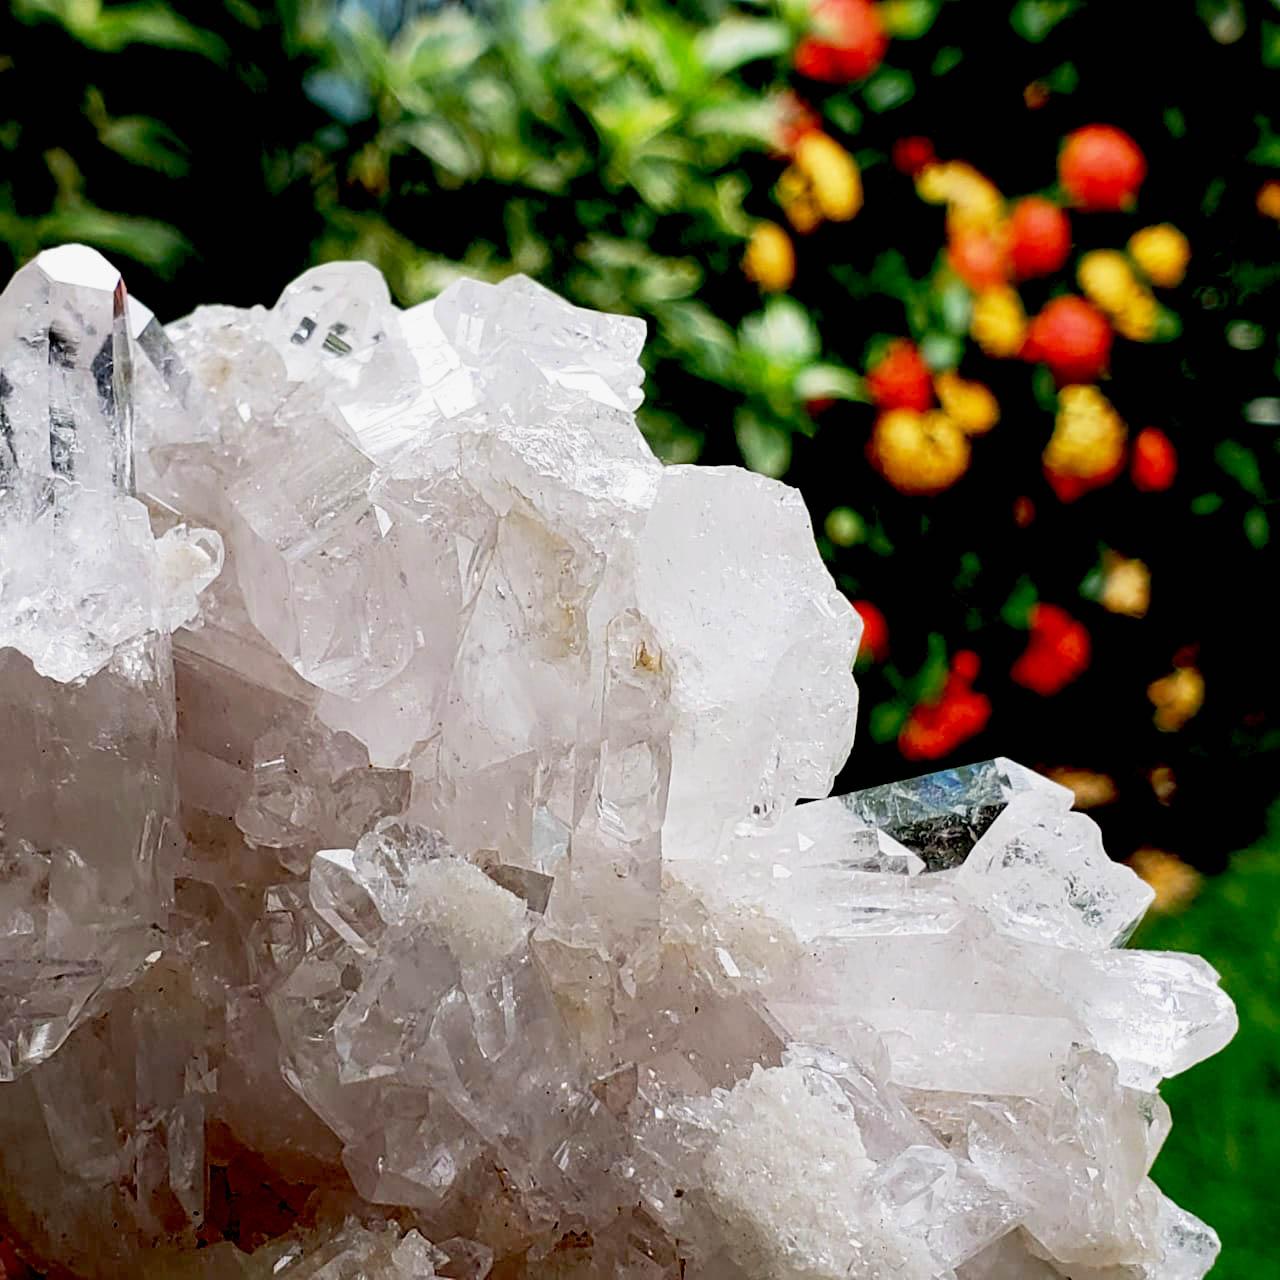 Cristal - Drusa - Quartzo Branco - Abertura de Luz